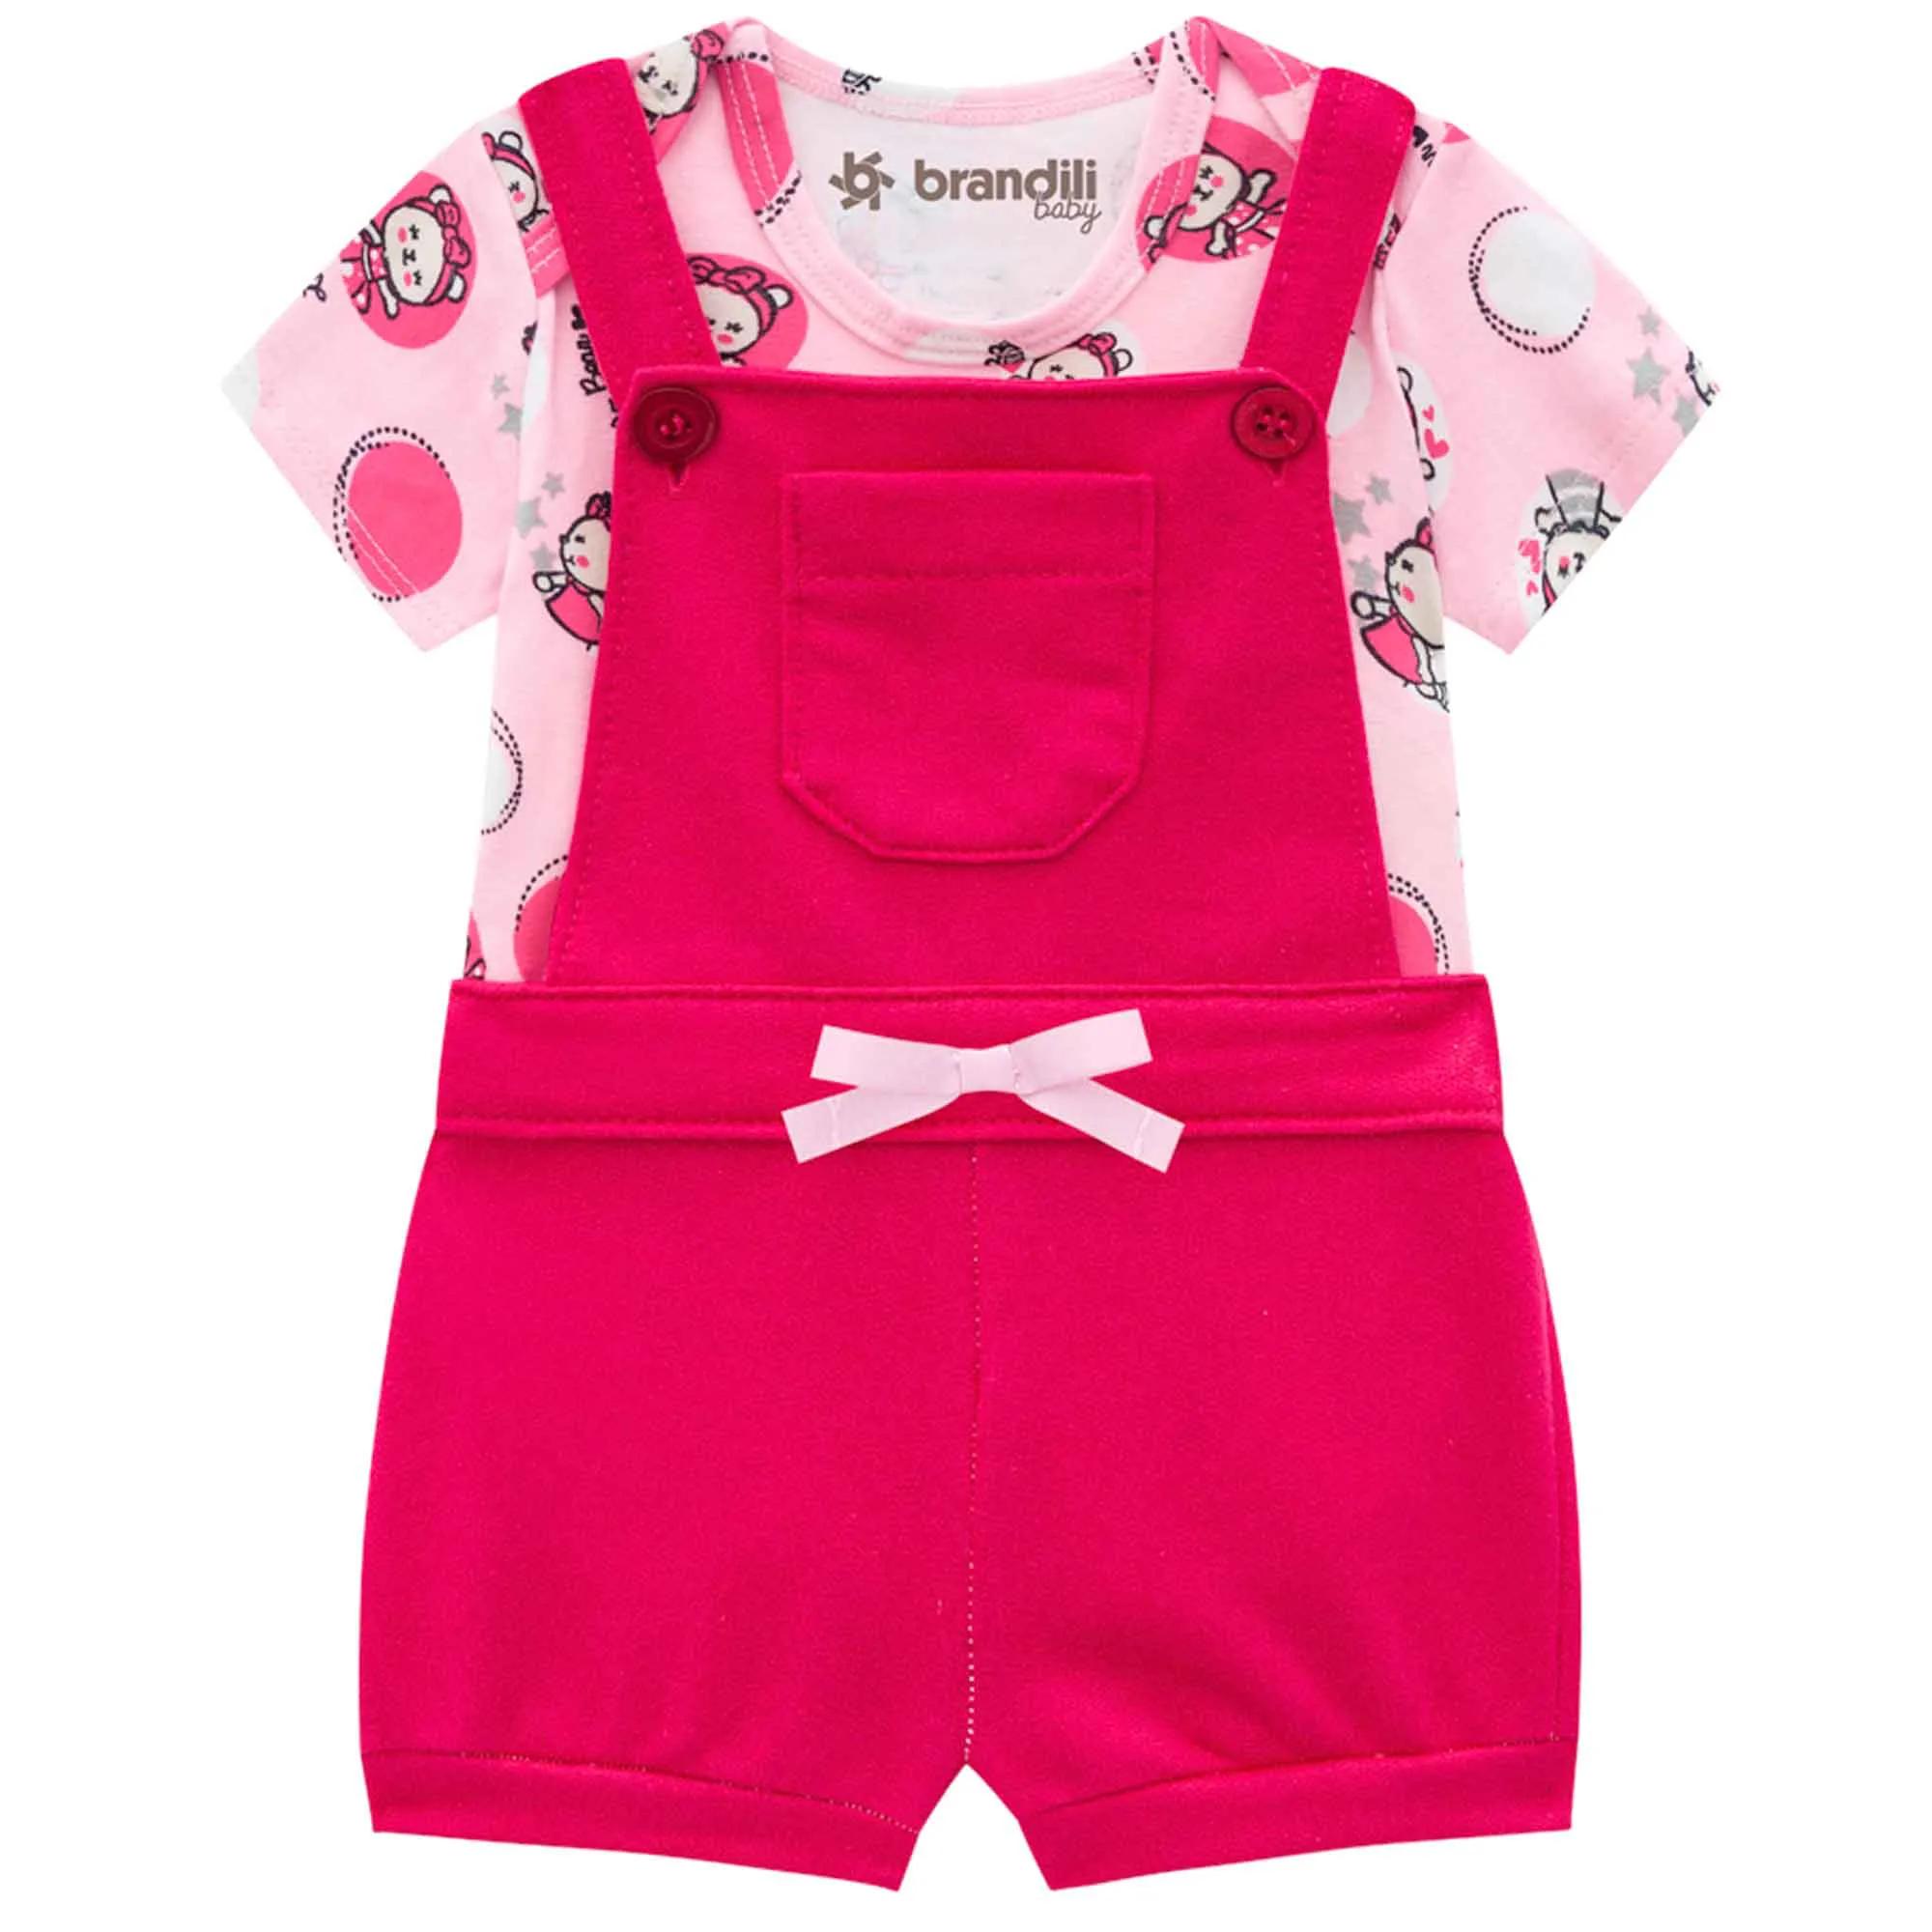 Conjunto Brandili Baby Body e Jardineira - P ao G